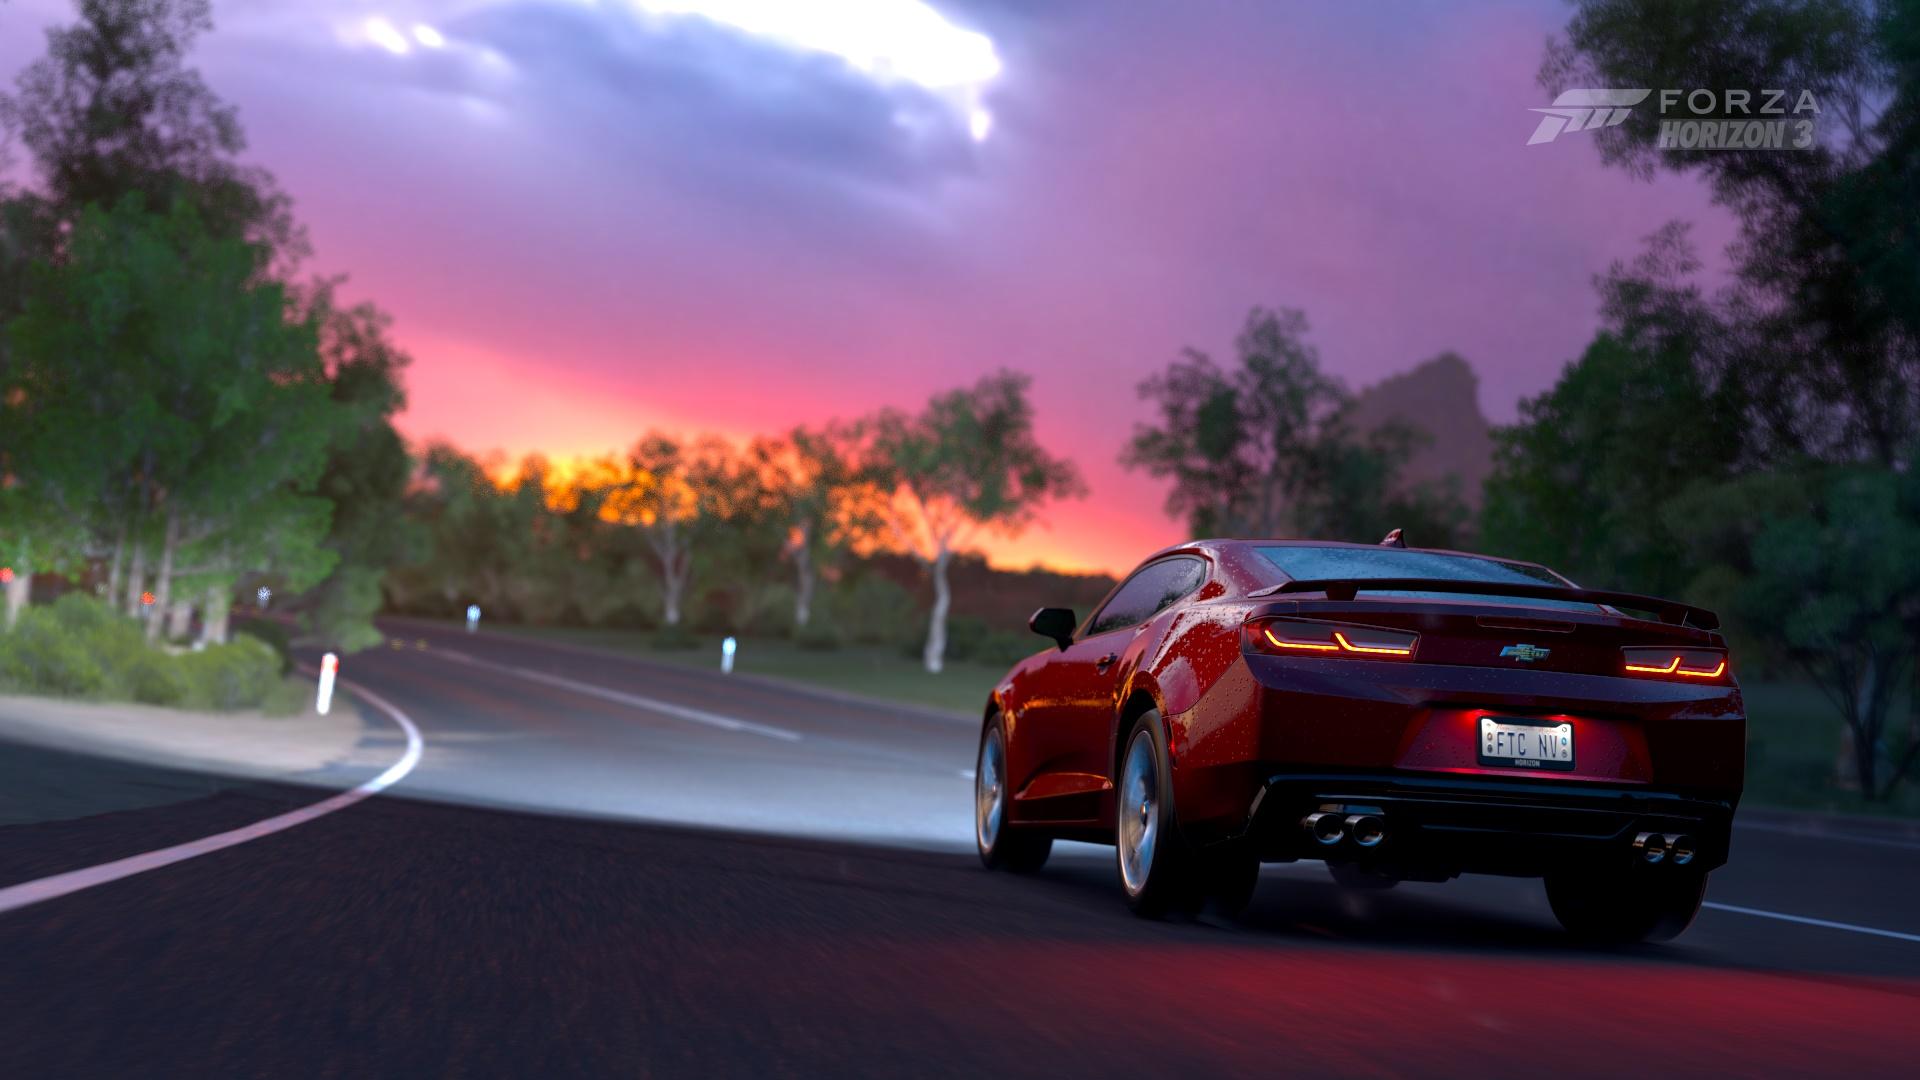 Forza Horizon 3 Wallpaper Engine Free